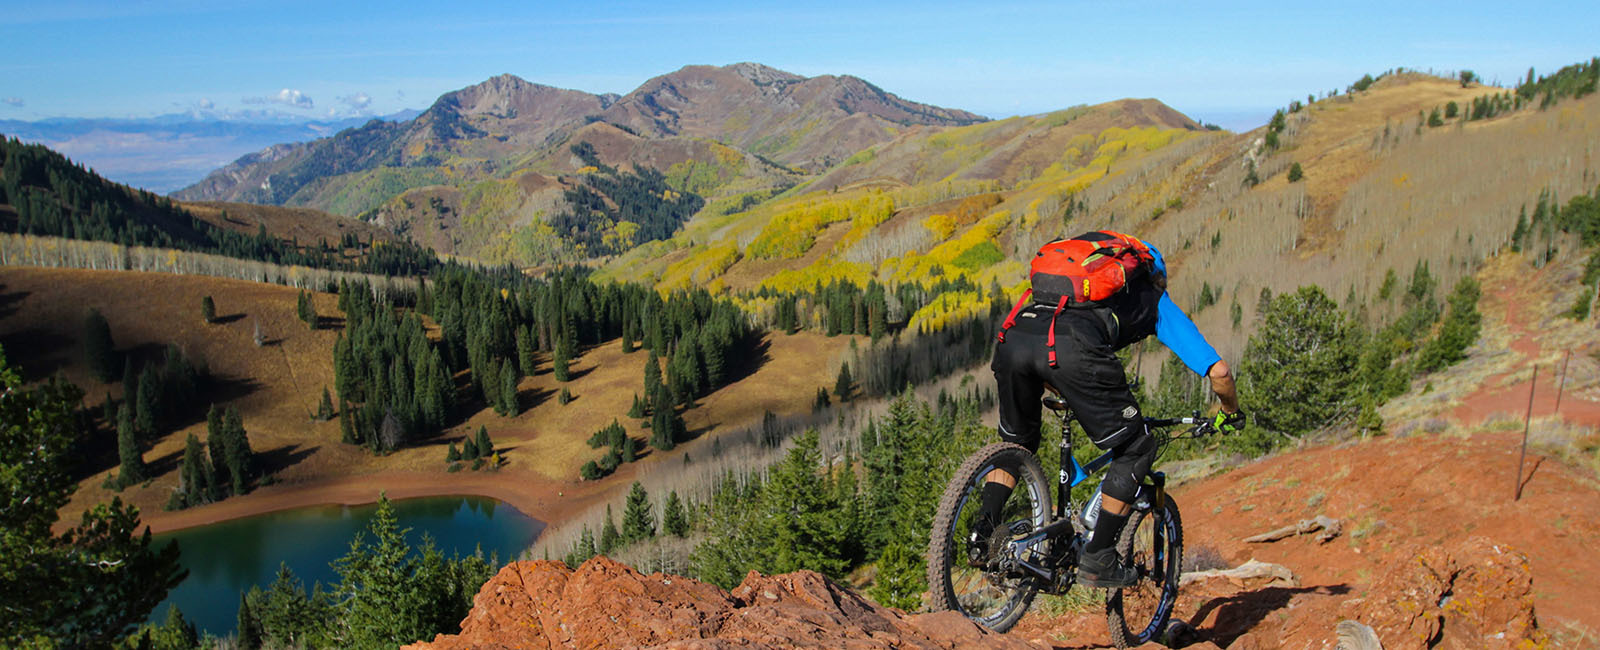 The Wasatch Crest Mountain Bike Trail: Salt Lake's Finest Ride